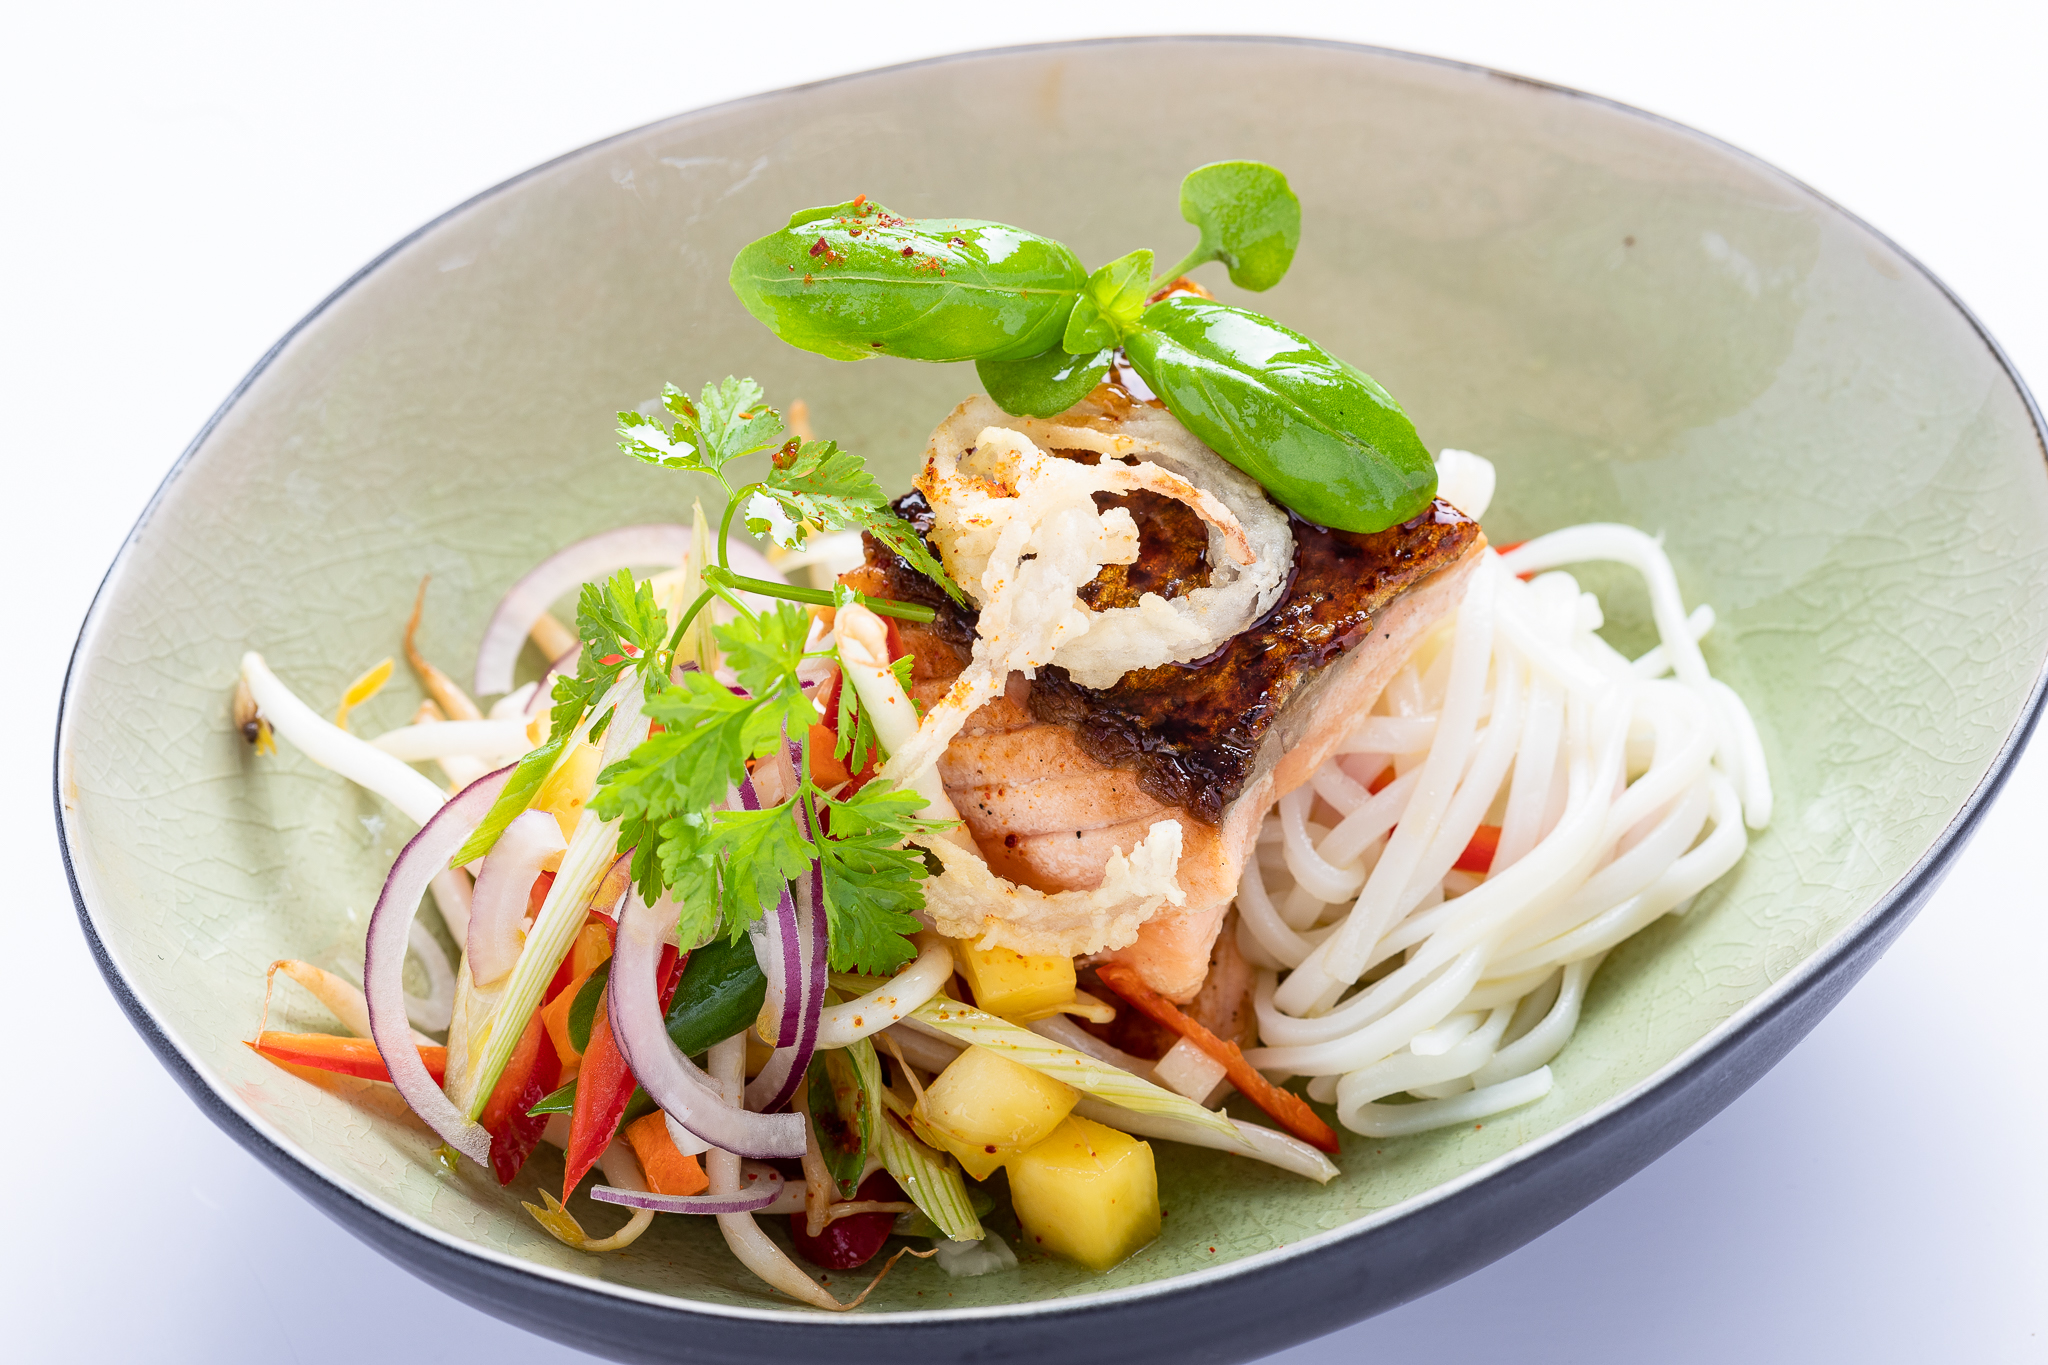 Zalm 'Japanese style' gelakt met teriyakisaus, mangosalade, rijstnoedels - DEN GOUDEN KARPEL